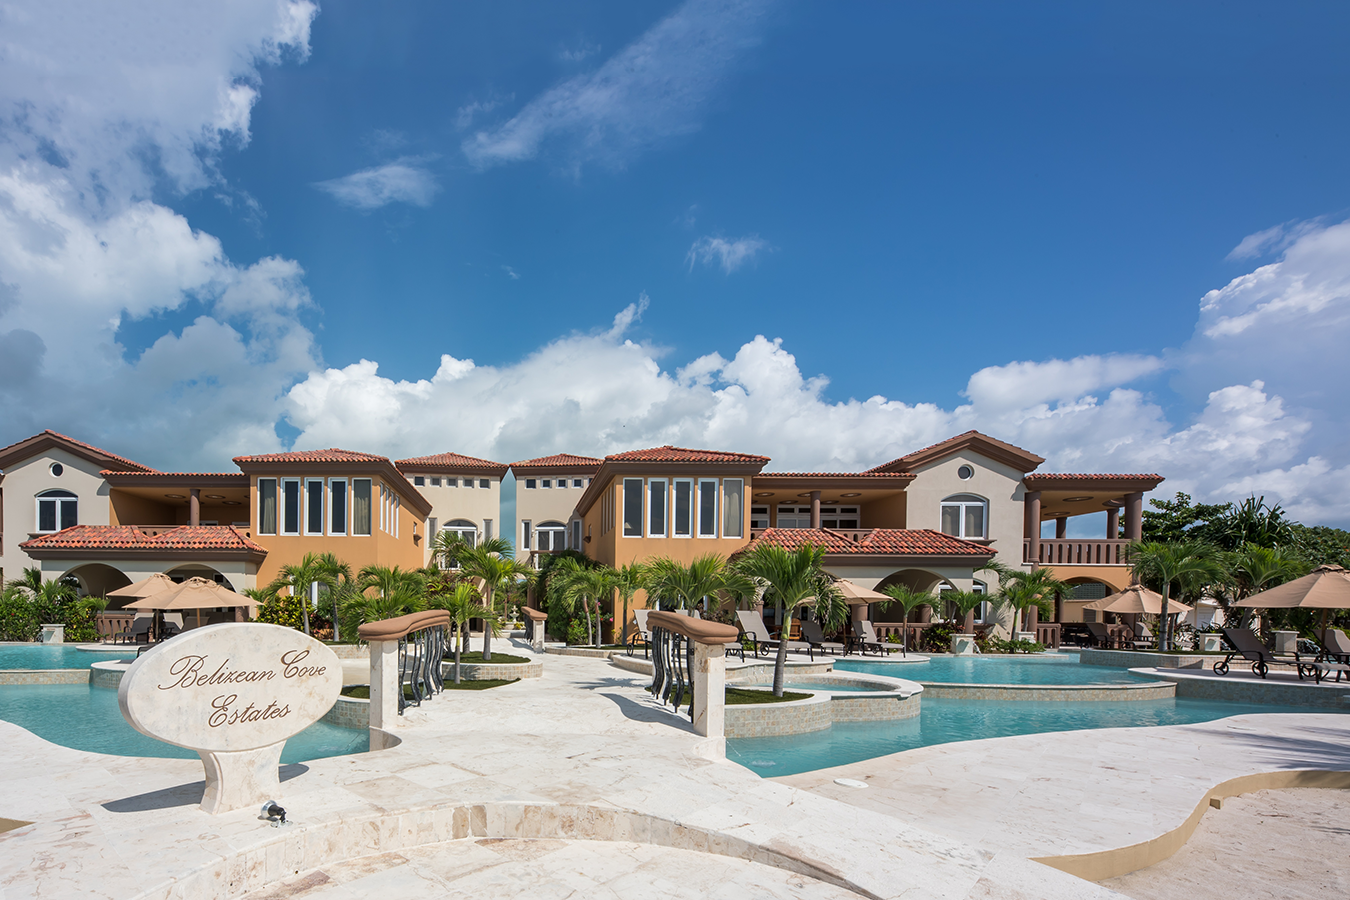 Belizean Cove Estates - Luxury Beachfront Vacation Rentals